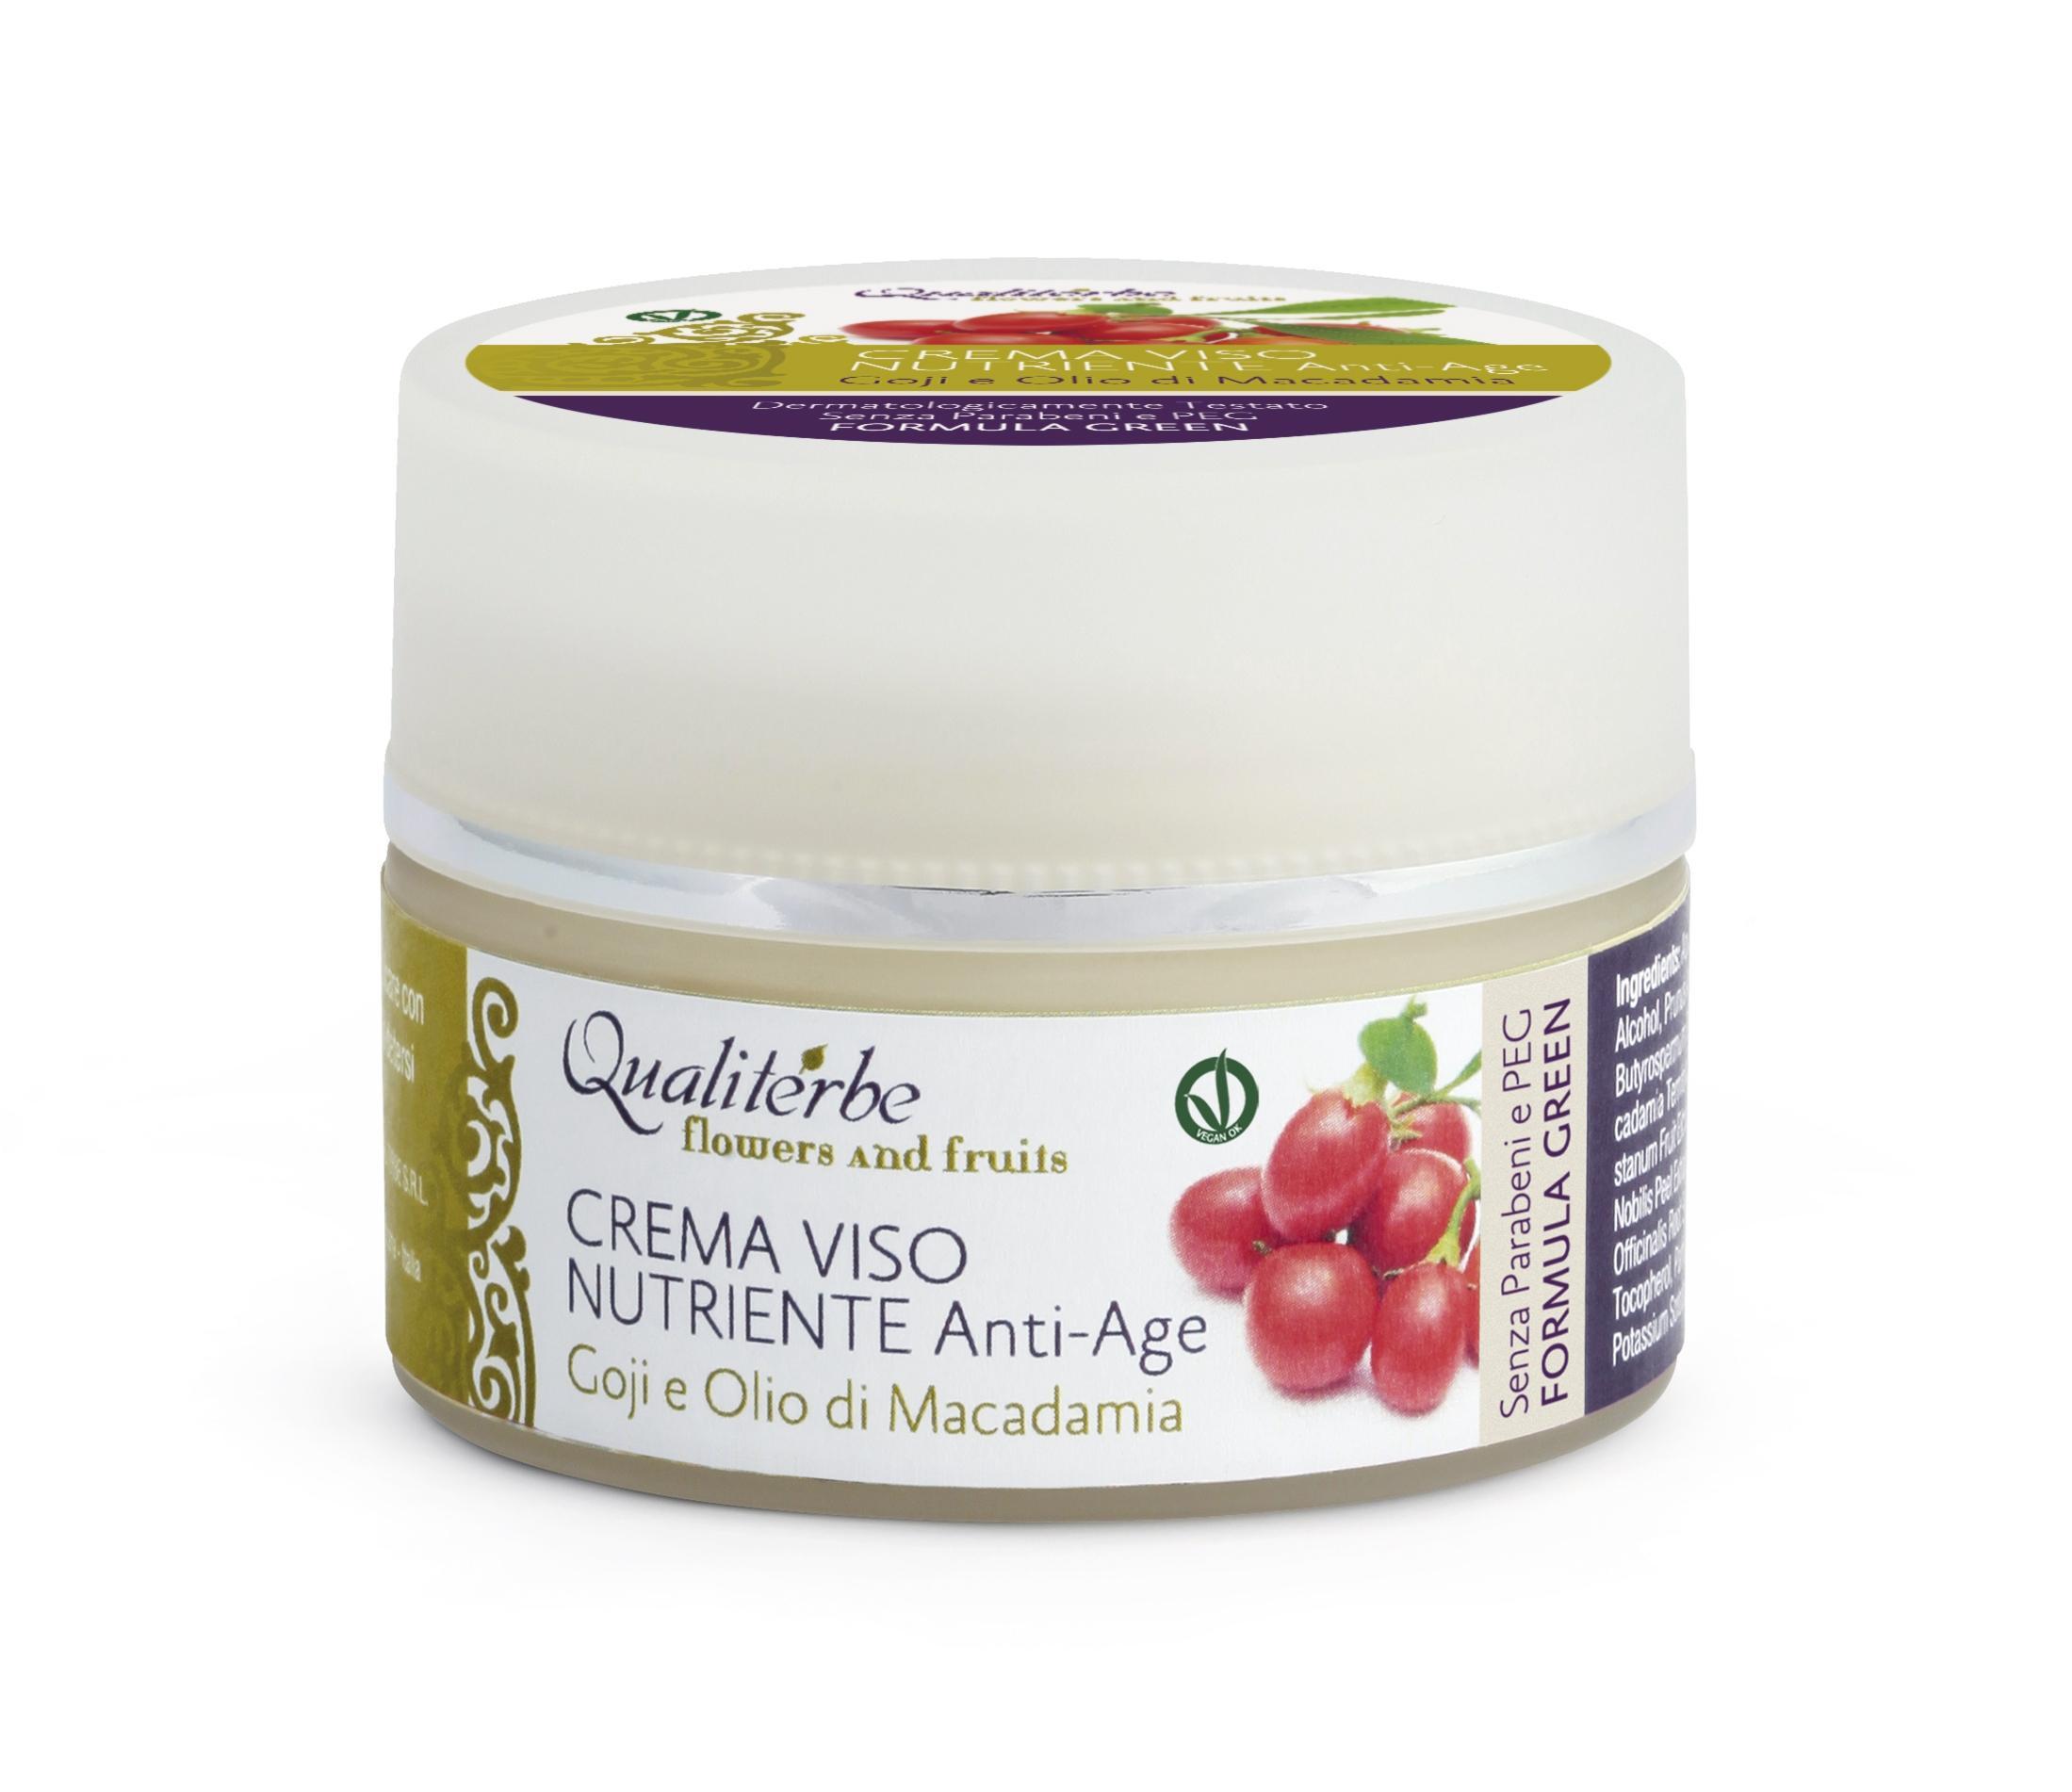 Crema Viso nutriente Flowers and fruits 50 ml - (Vegan ok)